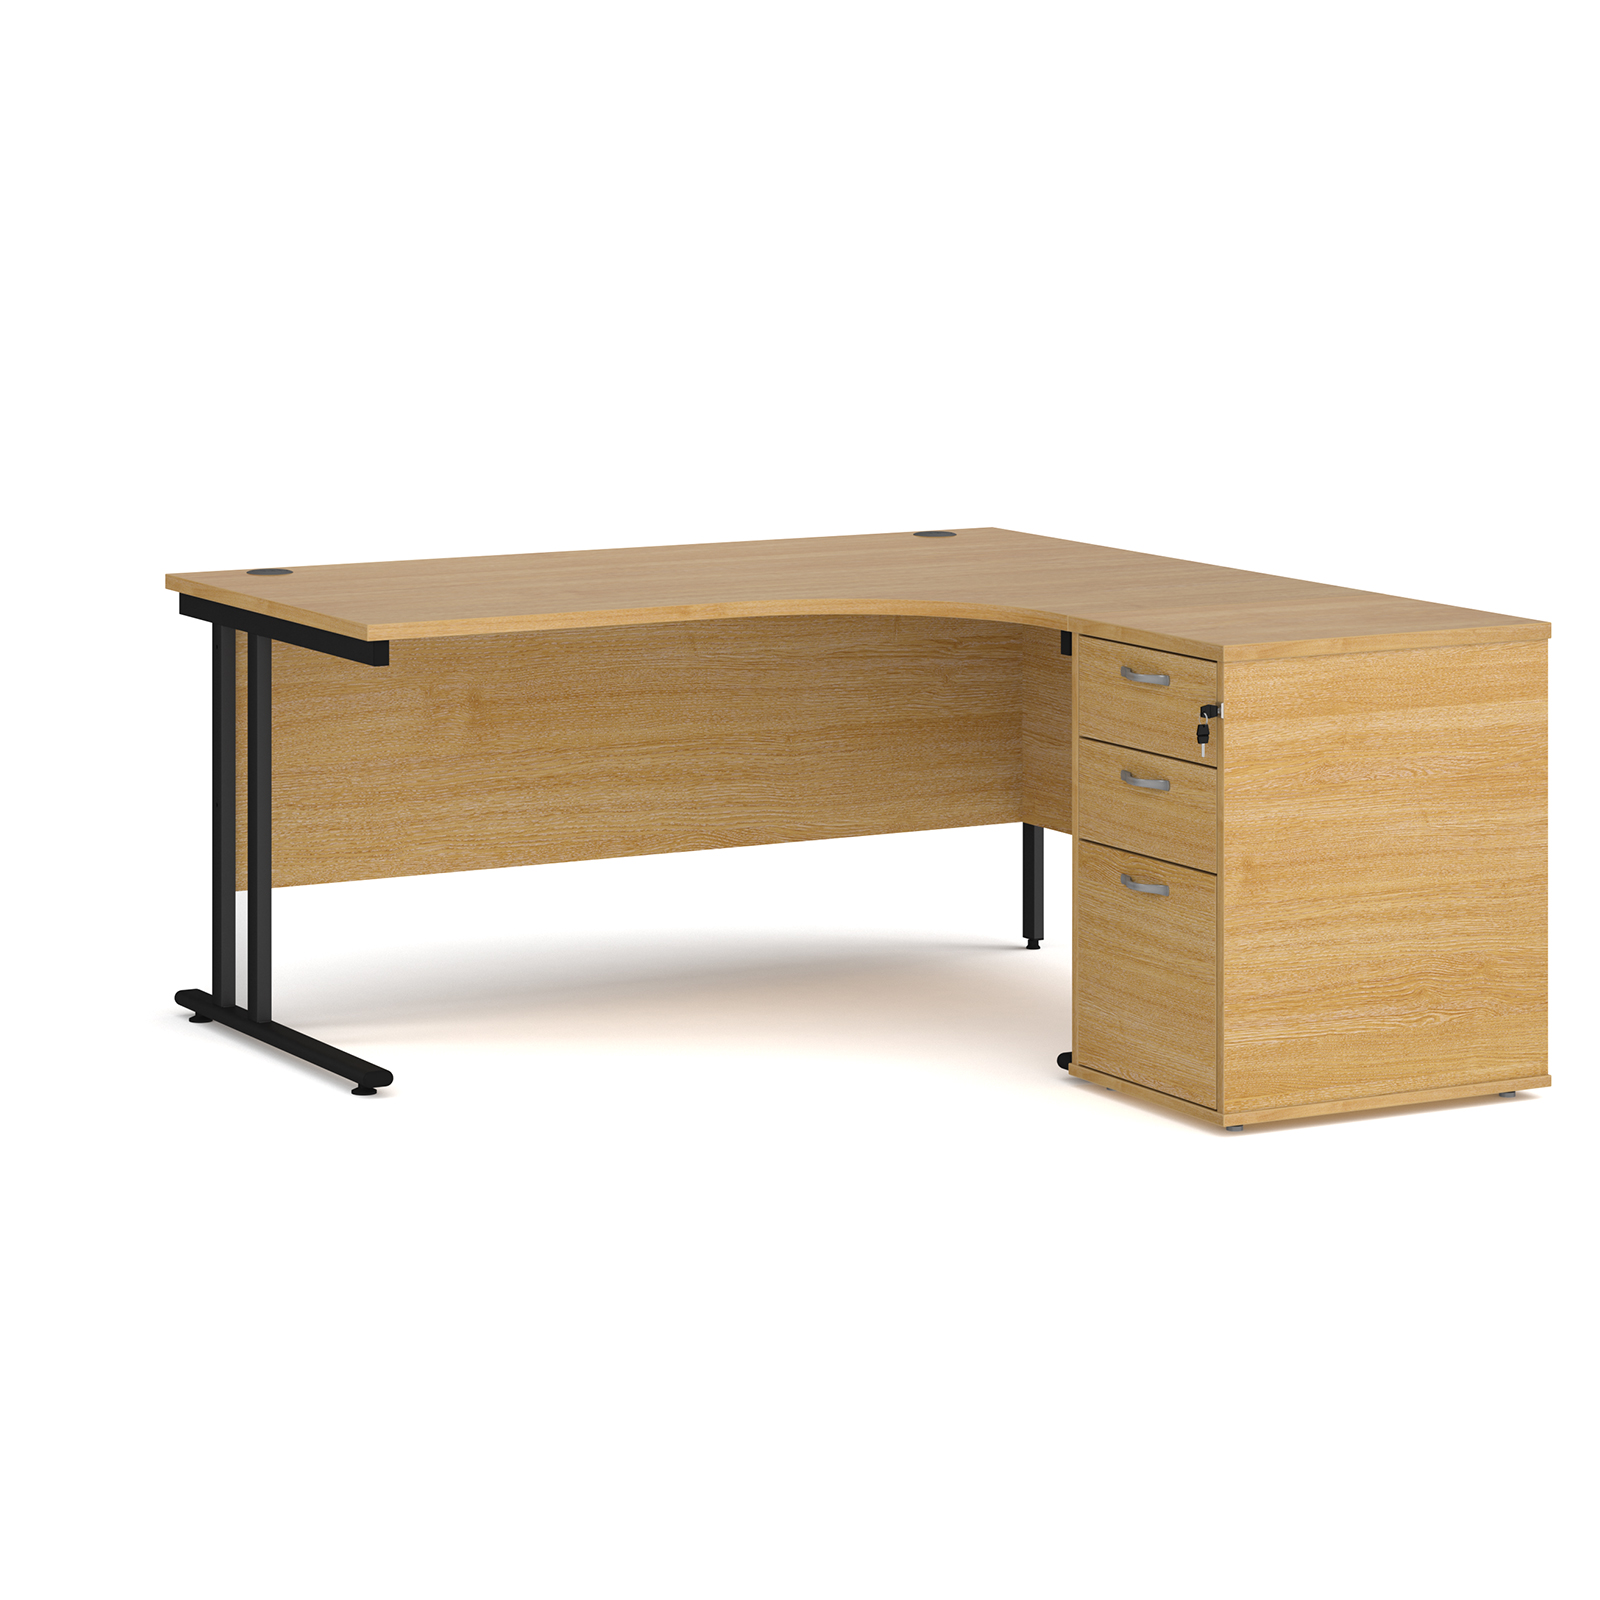 Right Handed Maestro 25 right hand ergonomic desk 1600mm with black cantilever frame and desk high pedestal - oak